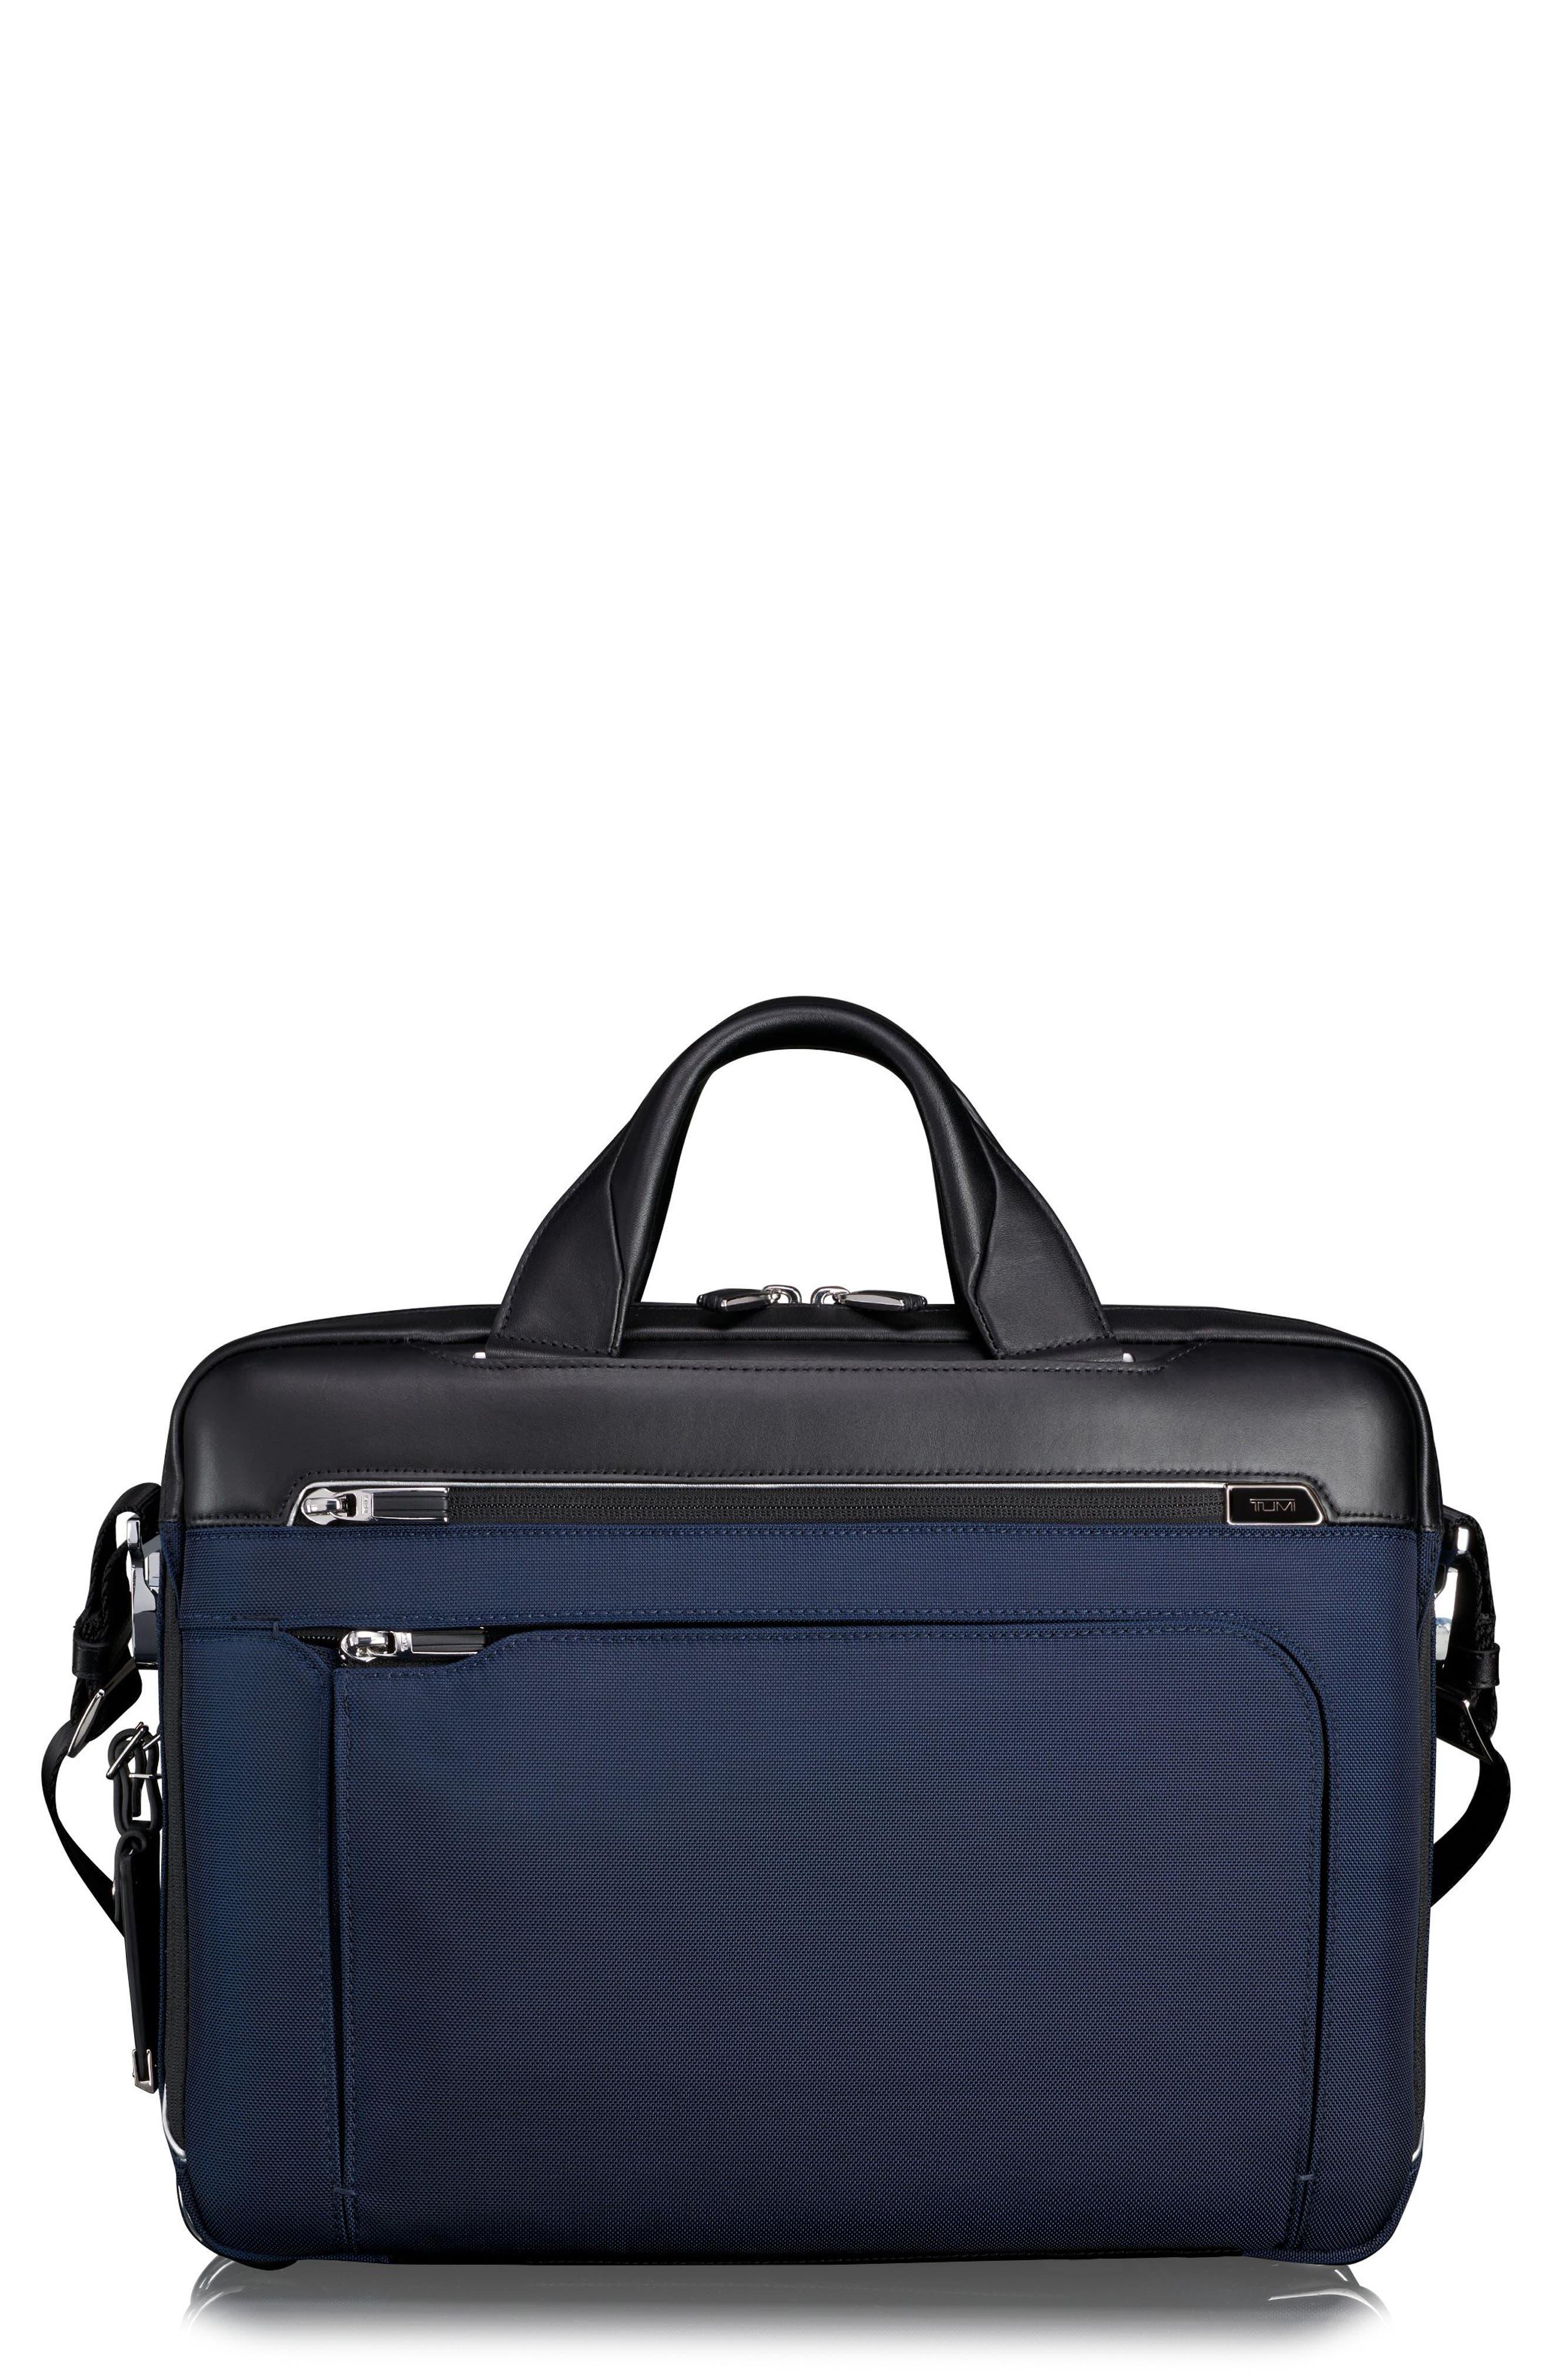 Sawyer Briefcase,                         Main,                         color, 415